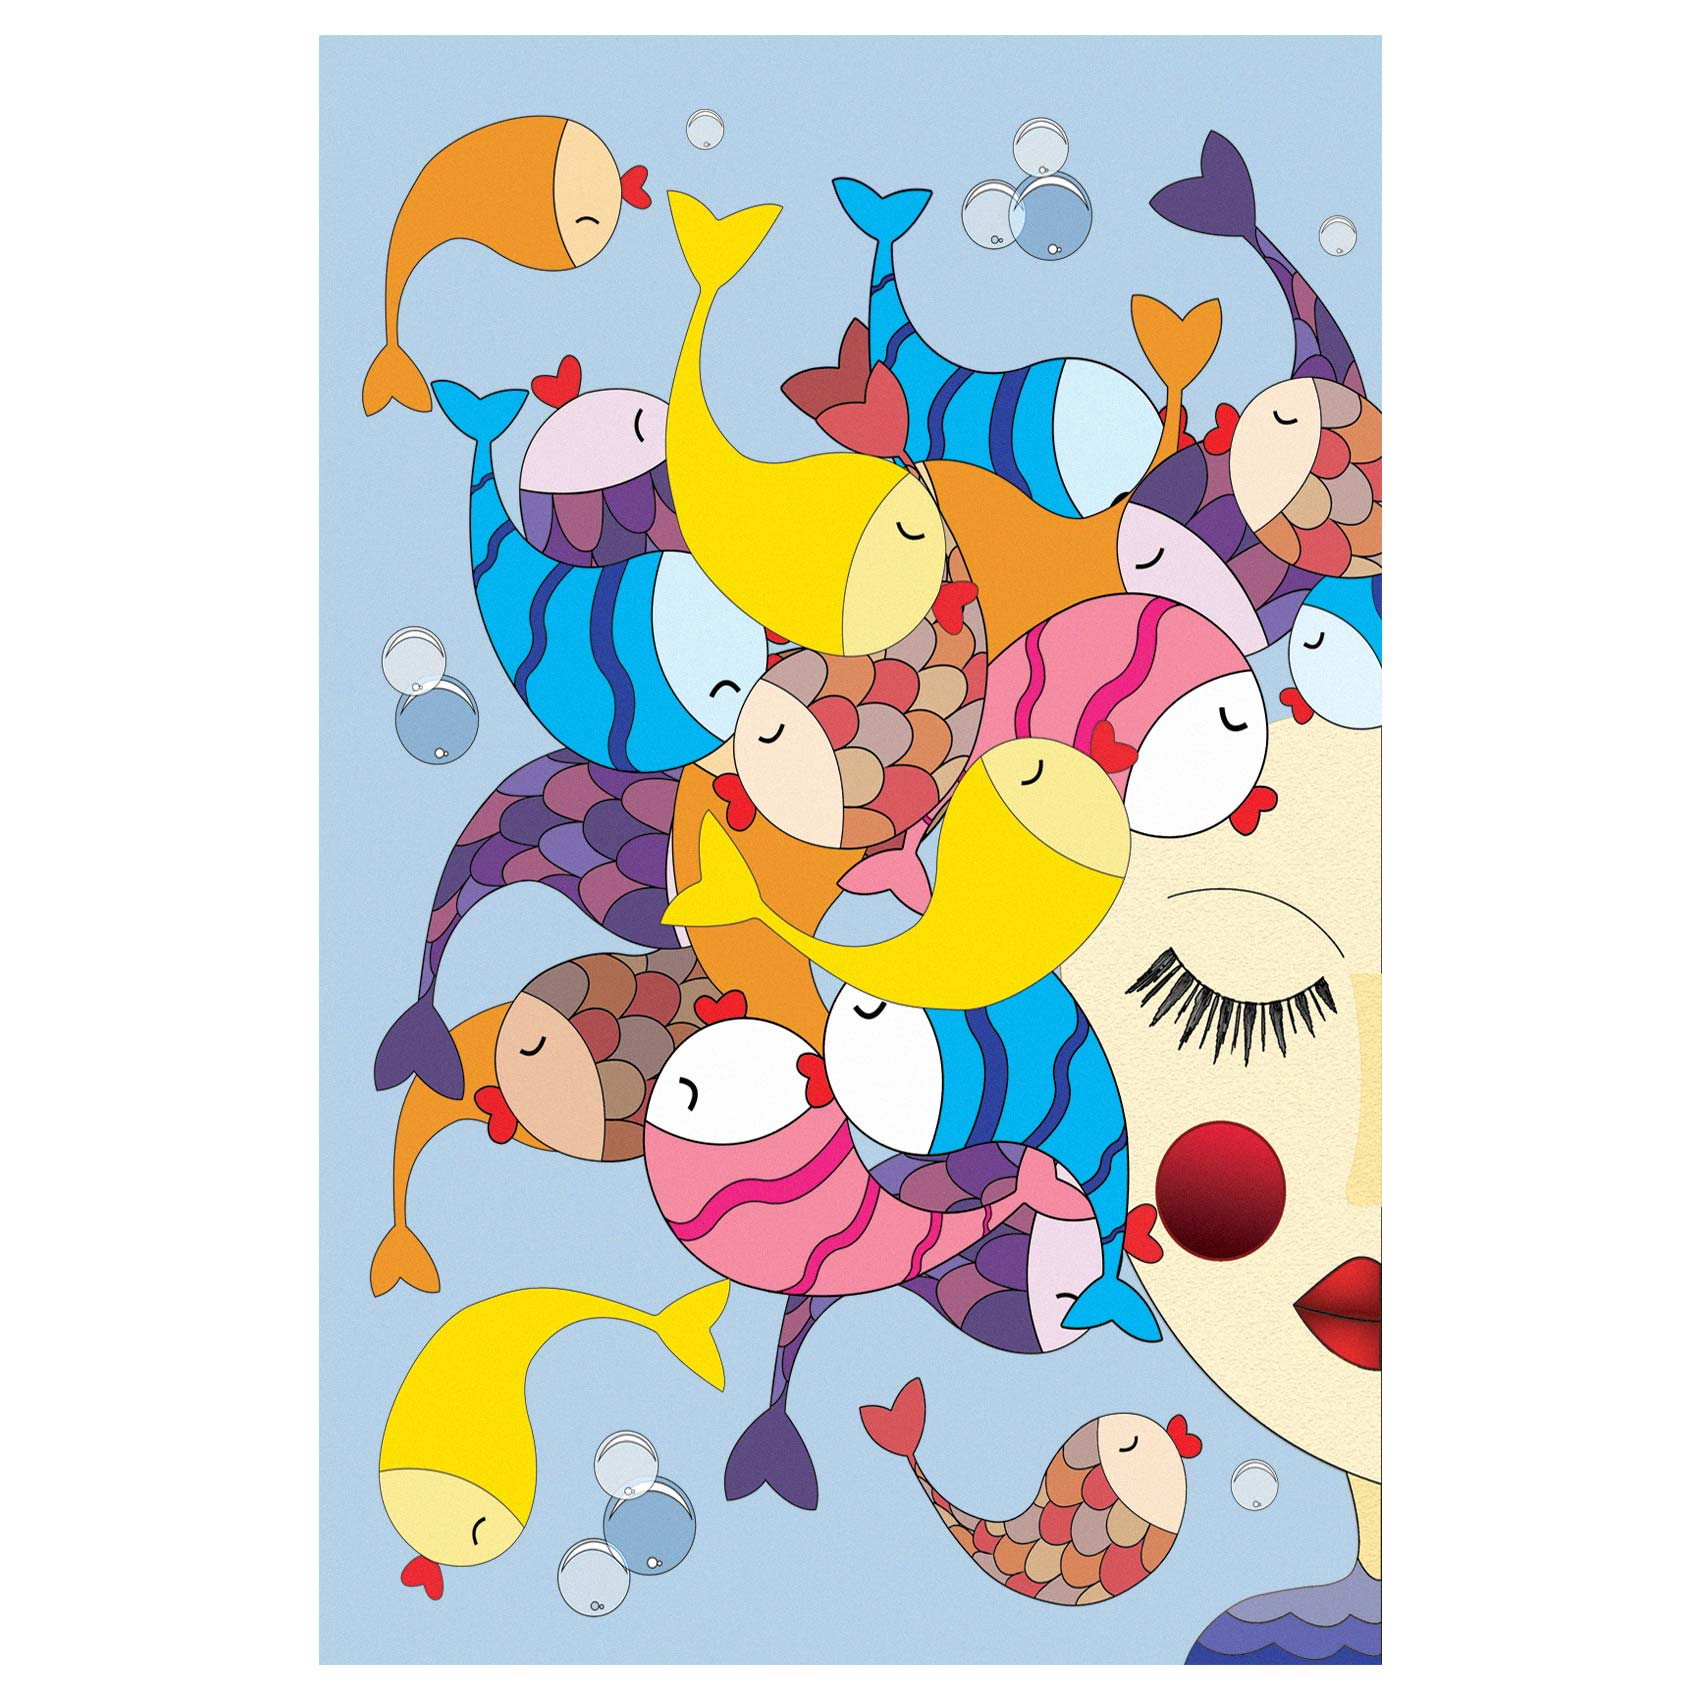 کارت پستال انتشارات سیبان مدل ماهی رقصان